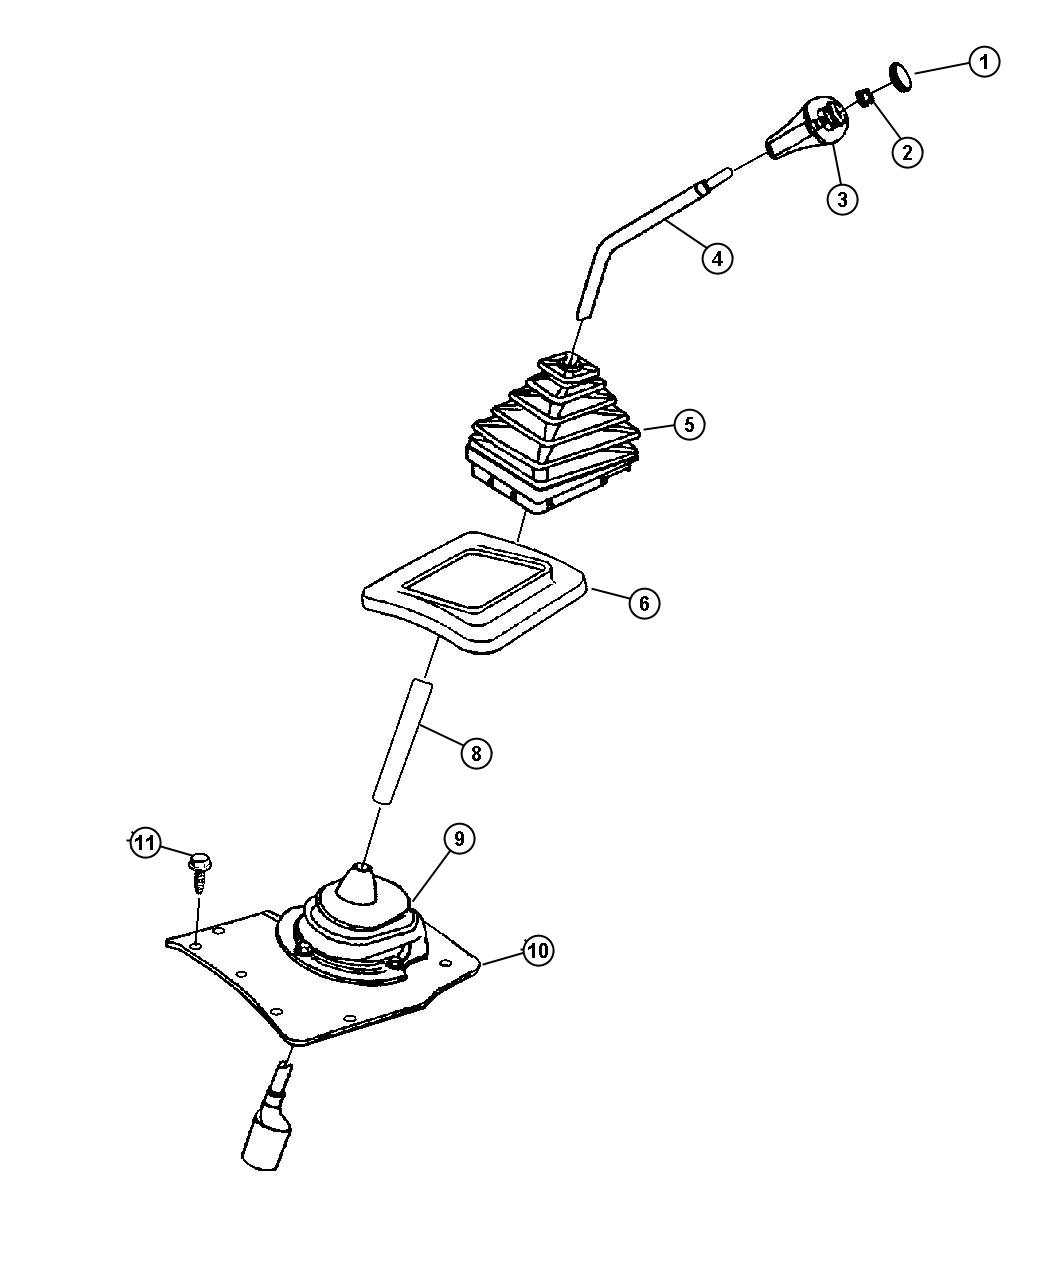 Onan Rv Generator Schematics - Wiring Diagrams Dock